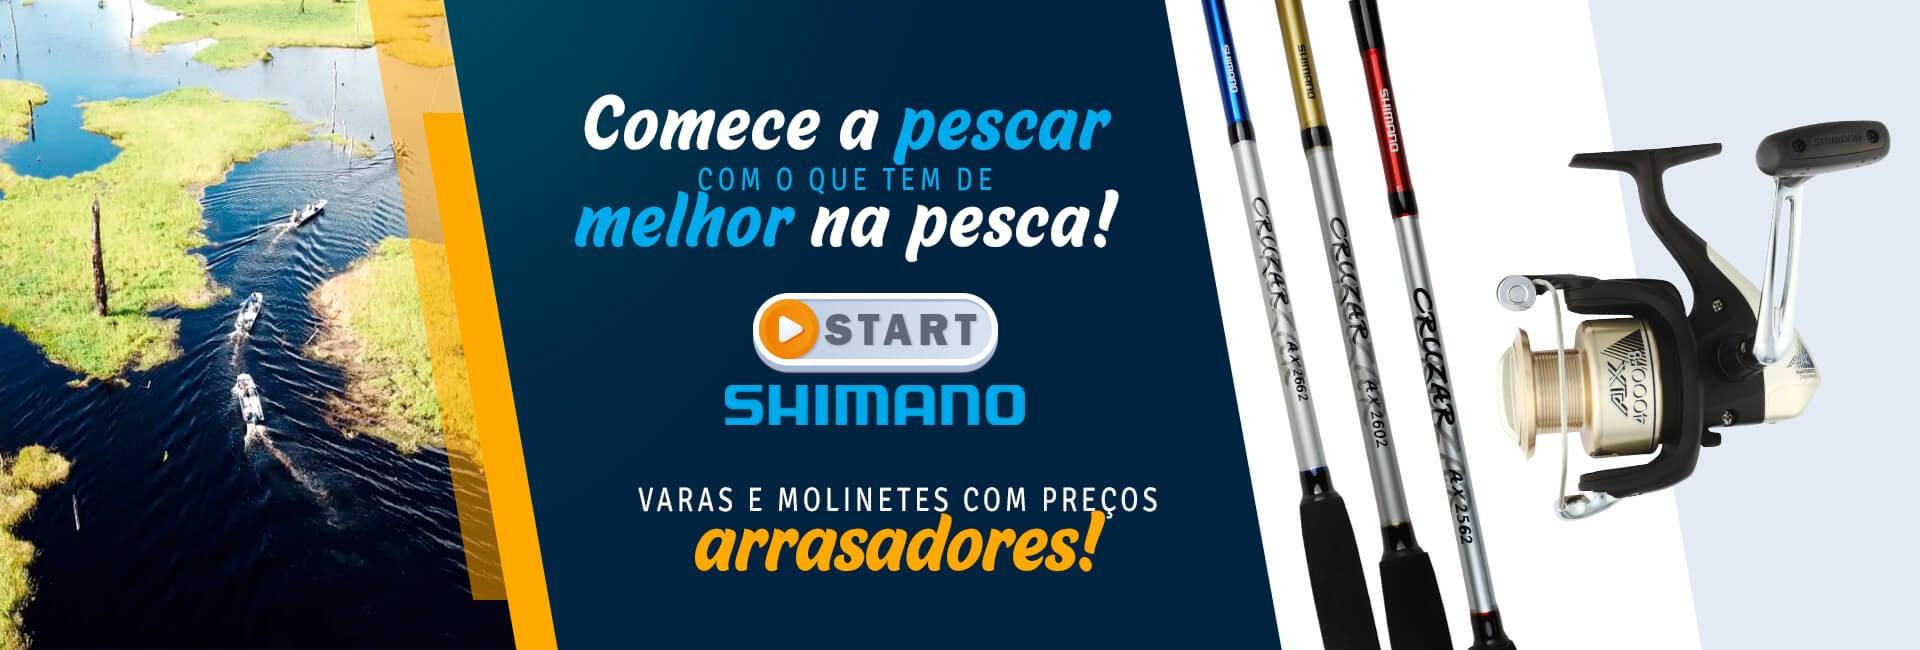 Start Shimano